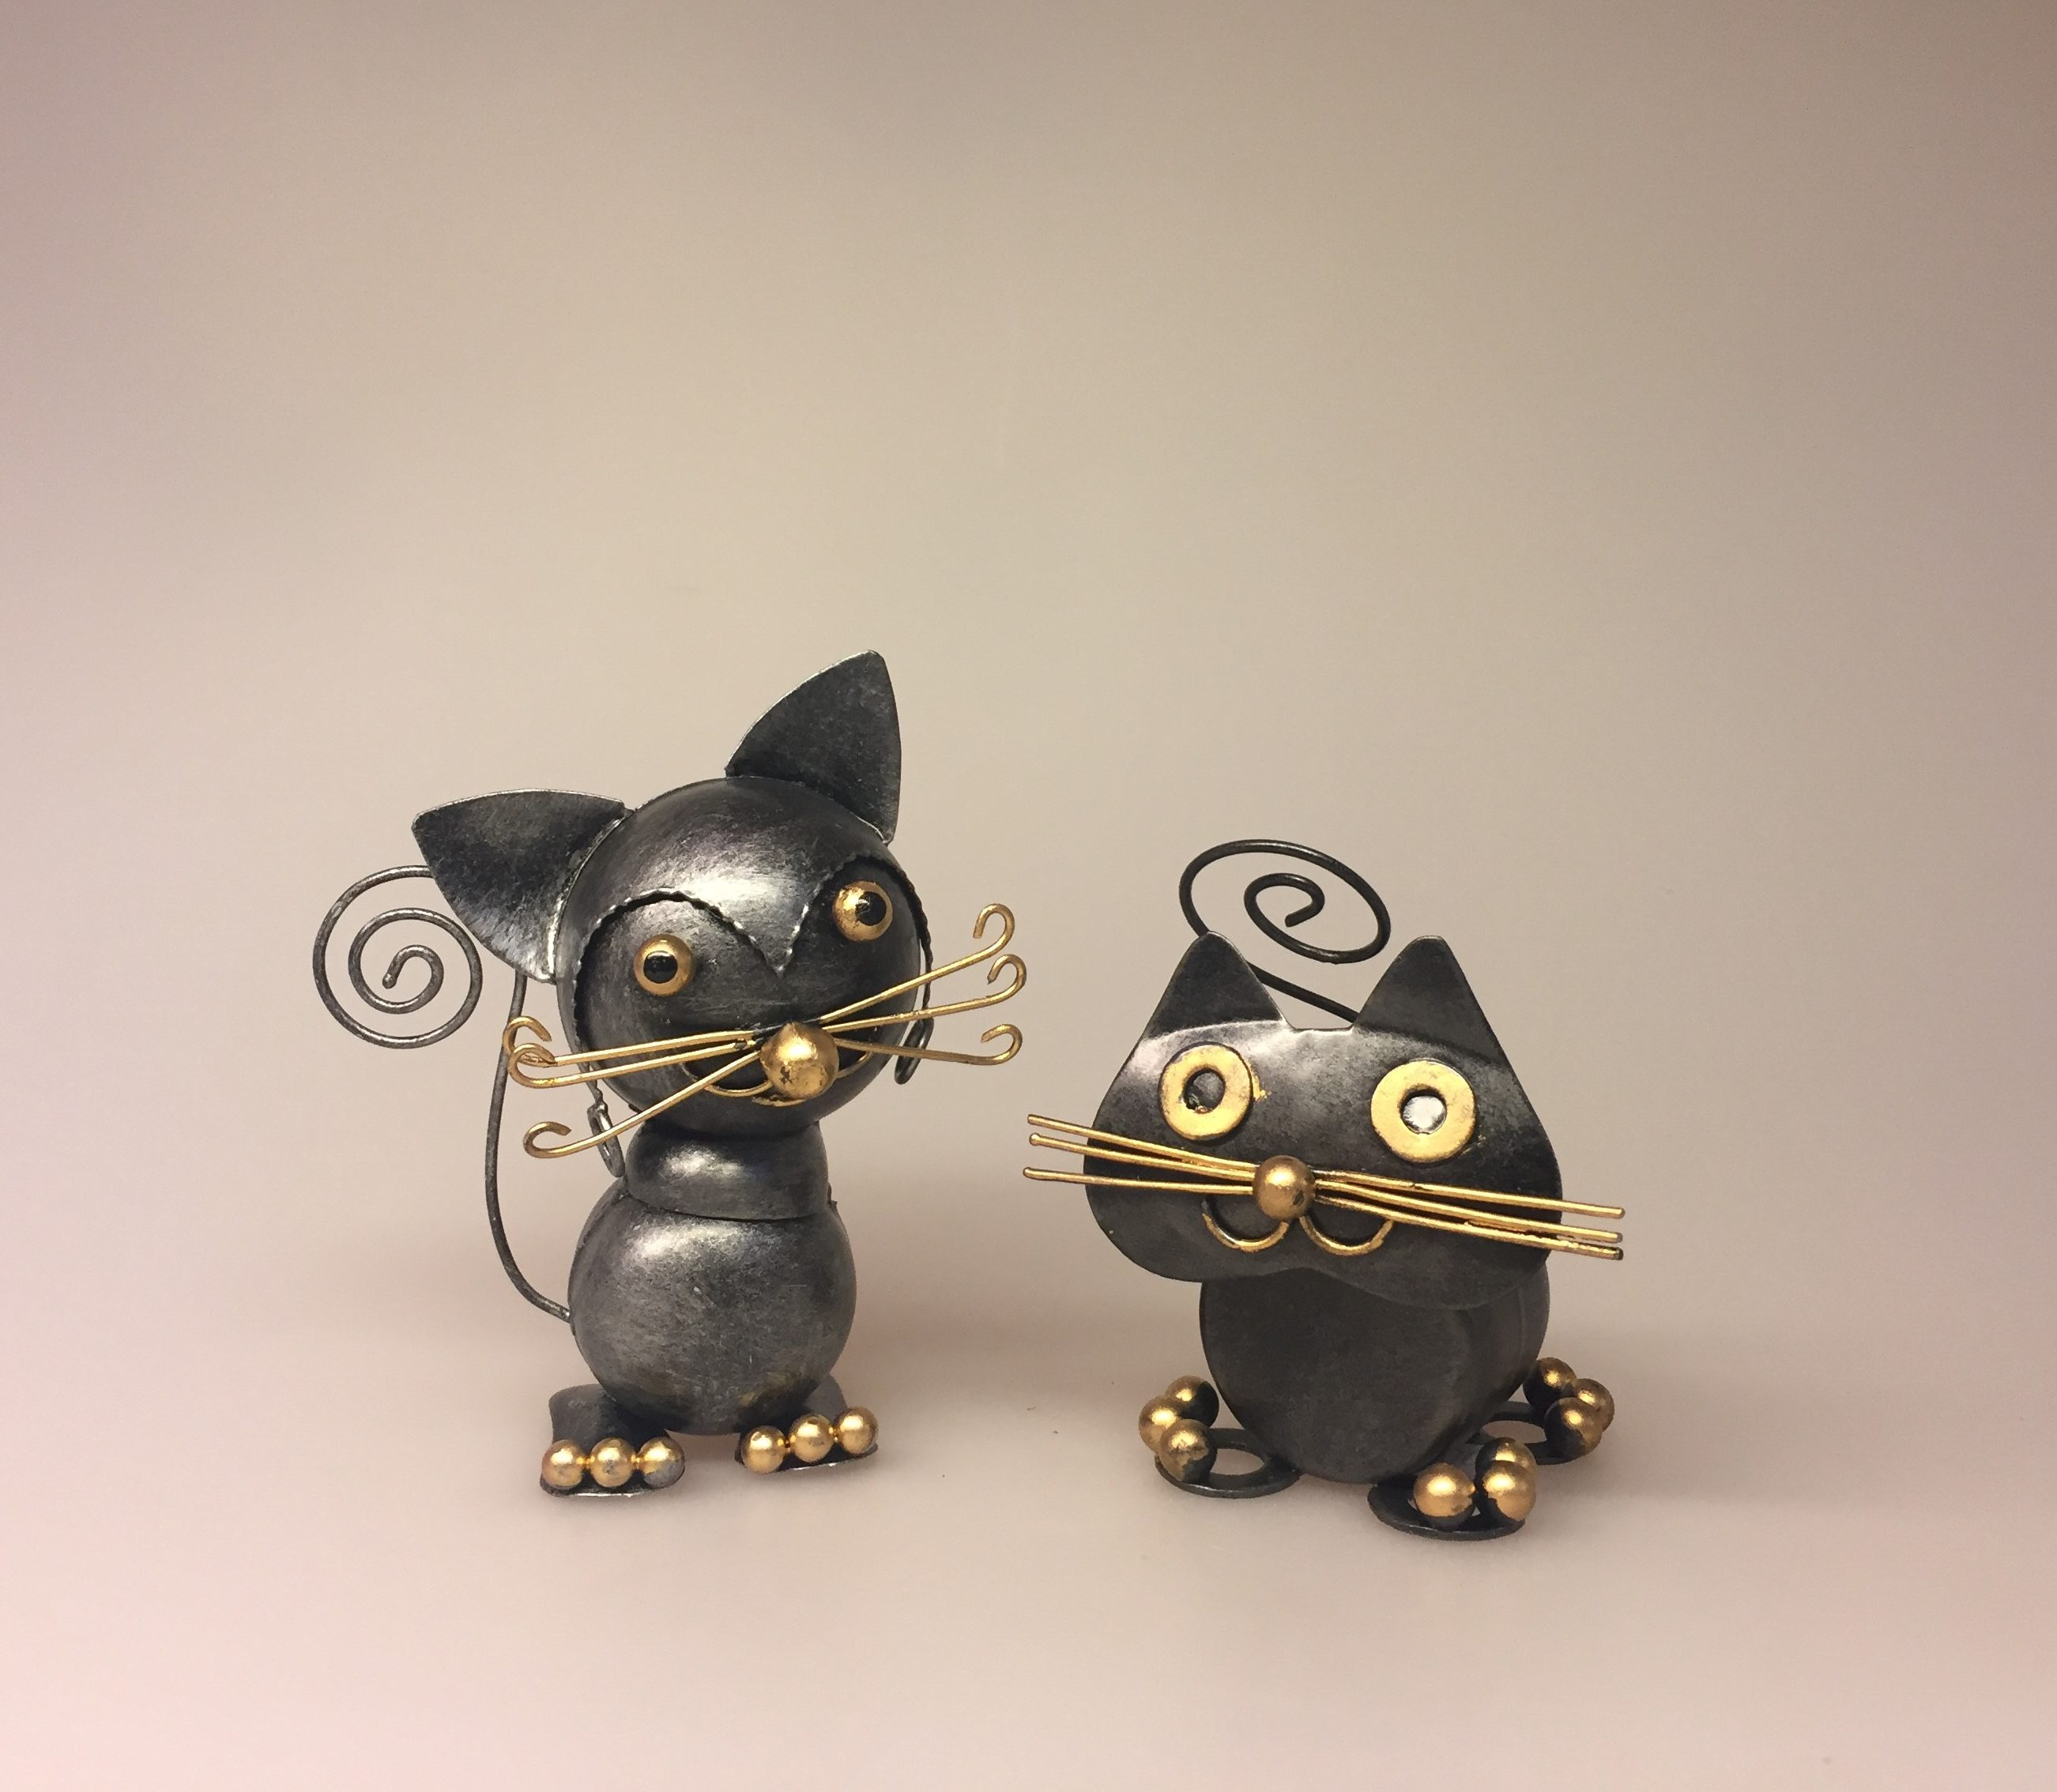 Metalfigur - Sort kat lille Fred - Metalfigur - Sort kat kugler, knurhår, kat til penge, pengekat, metalkat, metalfigur, kattefigur, ting med katte, katteting, ting til penge, penge i gave, gaveidé, studentergave, bryllupsgave, kunsthåndværk, håndlavet, kunst, mis, missekatte,